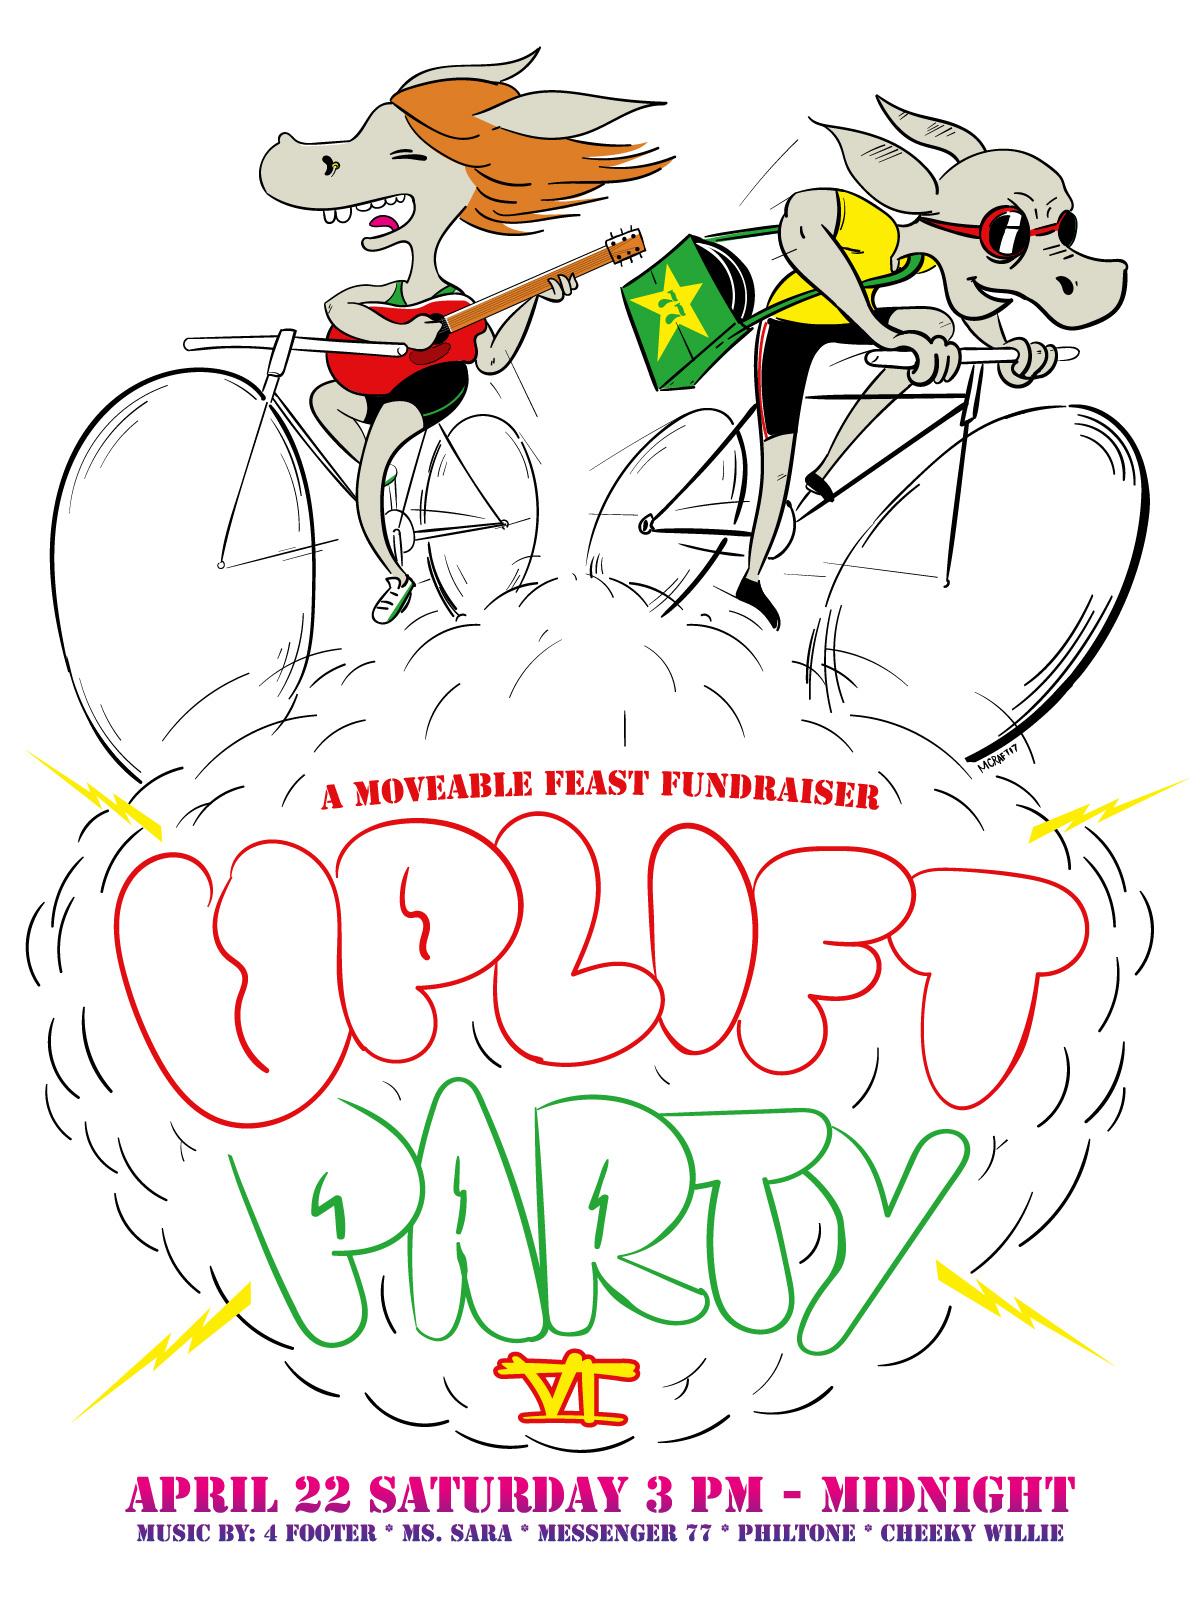 bike-messenger-uplift-party-illustration-02